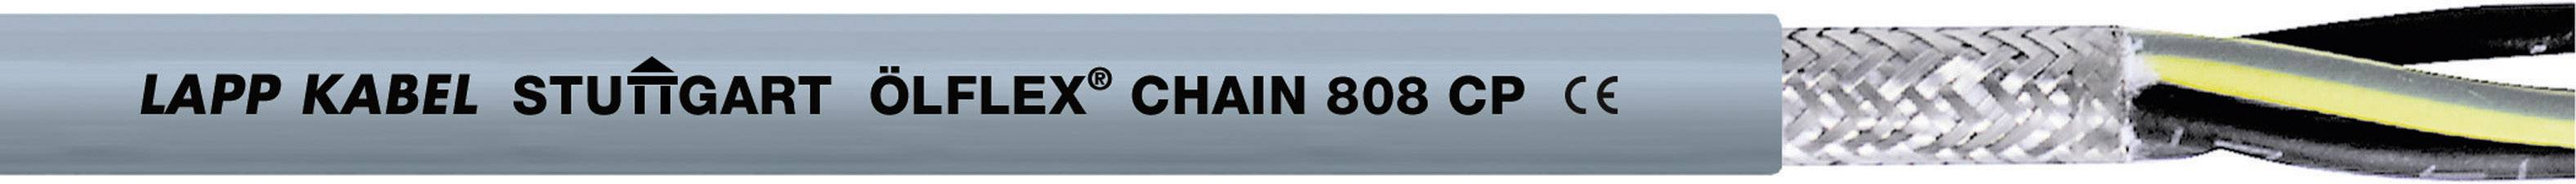 Žíla kabelu LappKabel ÖLFLEX CHAIN 808 CP 5G0,5 (1027754), 5x 0,5 mm², polyurethan, Ø 7,1 mm, stíněný, 1 m, še